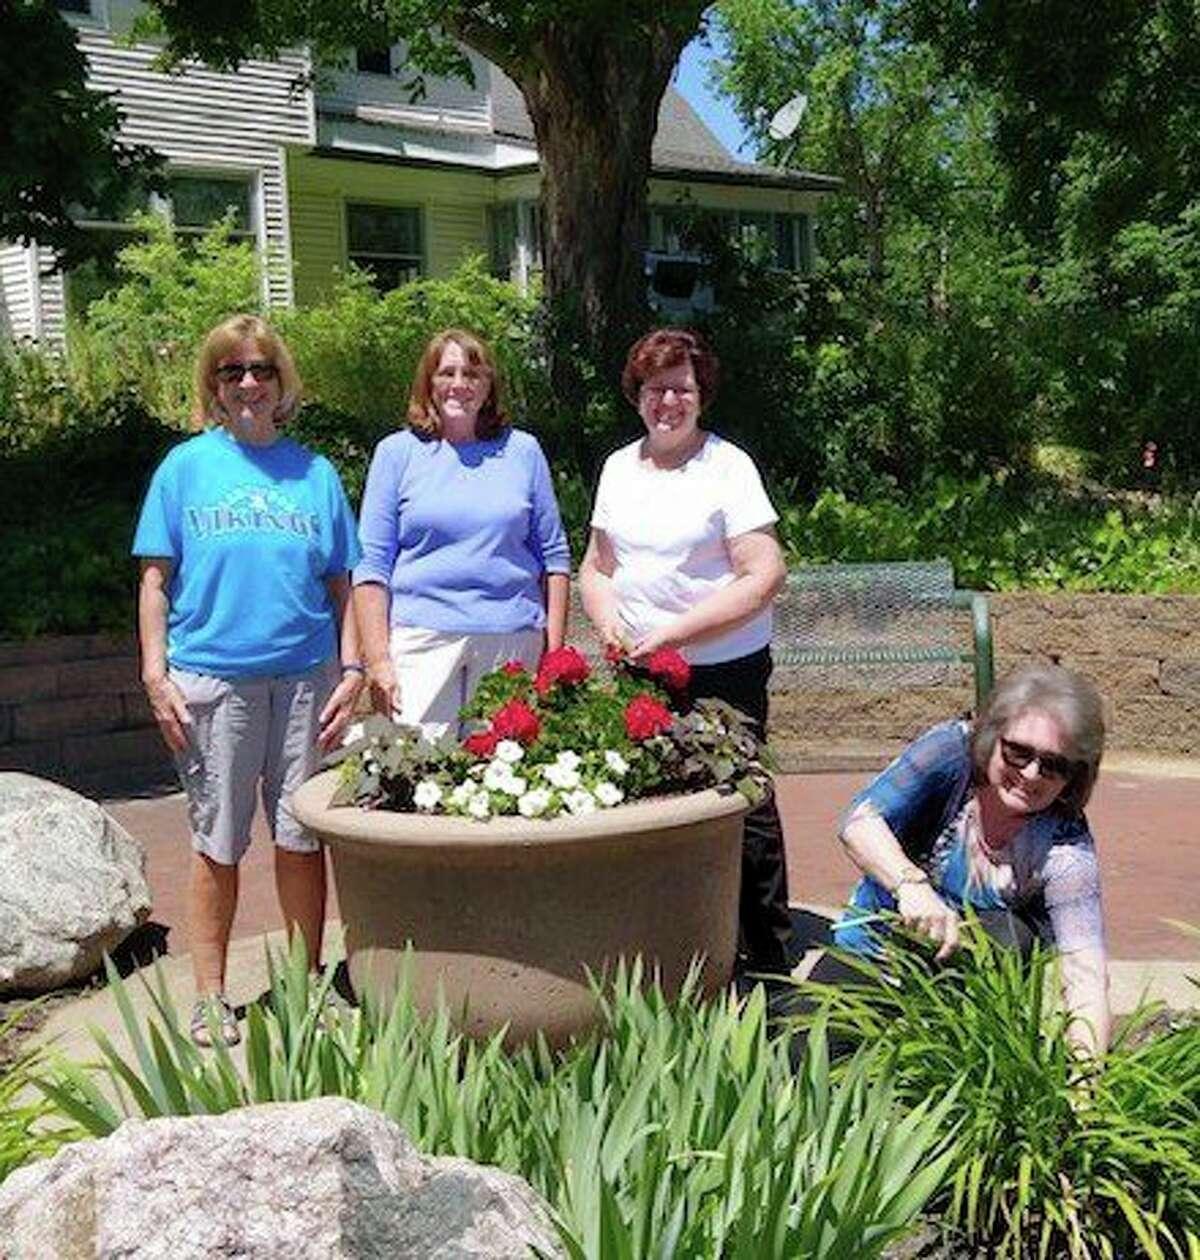 Pictured are GFWC Members Celeste Szczeroswki, Ann Stellard, Linda Telfer and Sue Johnson. Not pictured is Carrie Franklund and Beth Martz. (Courtesy photo)